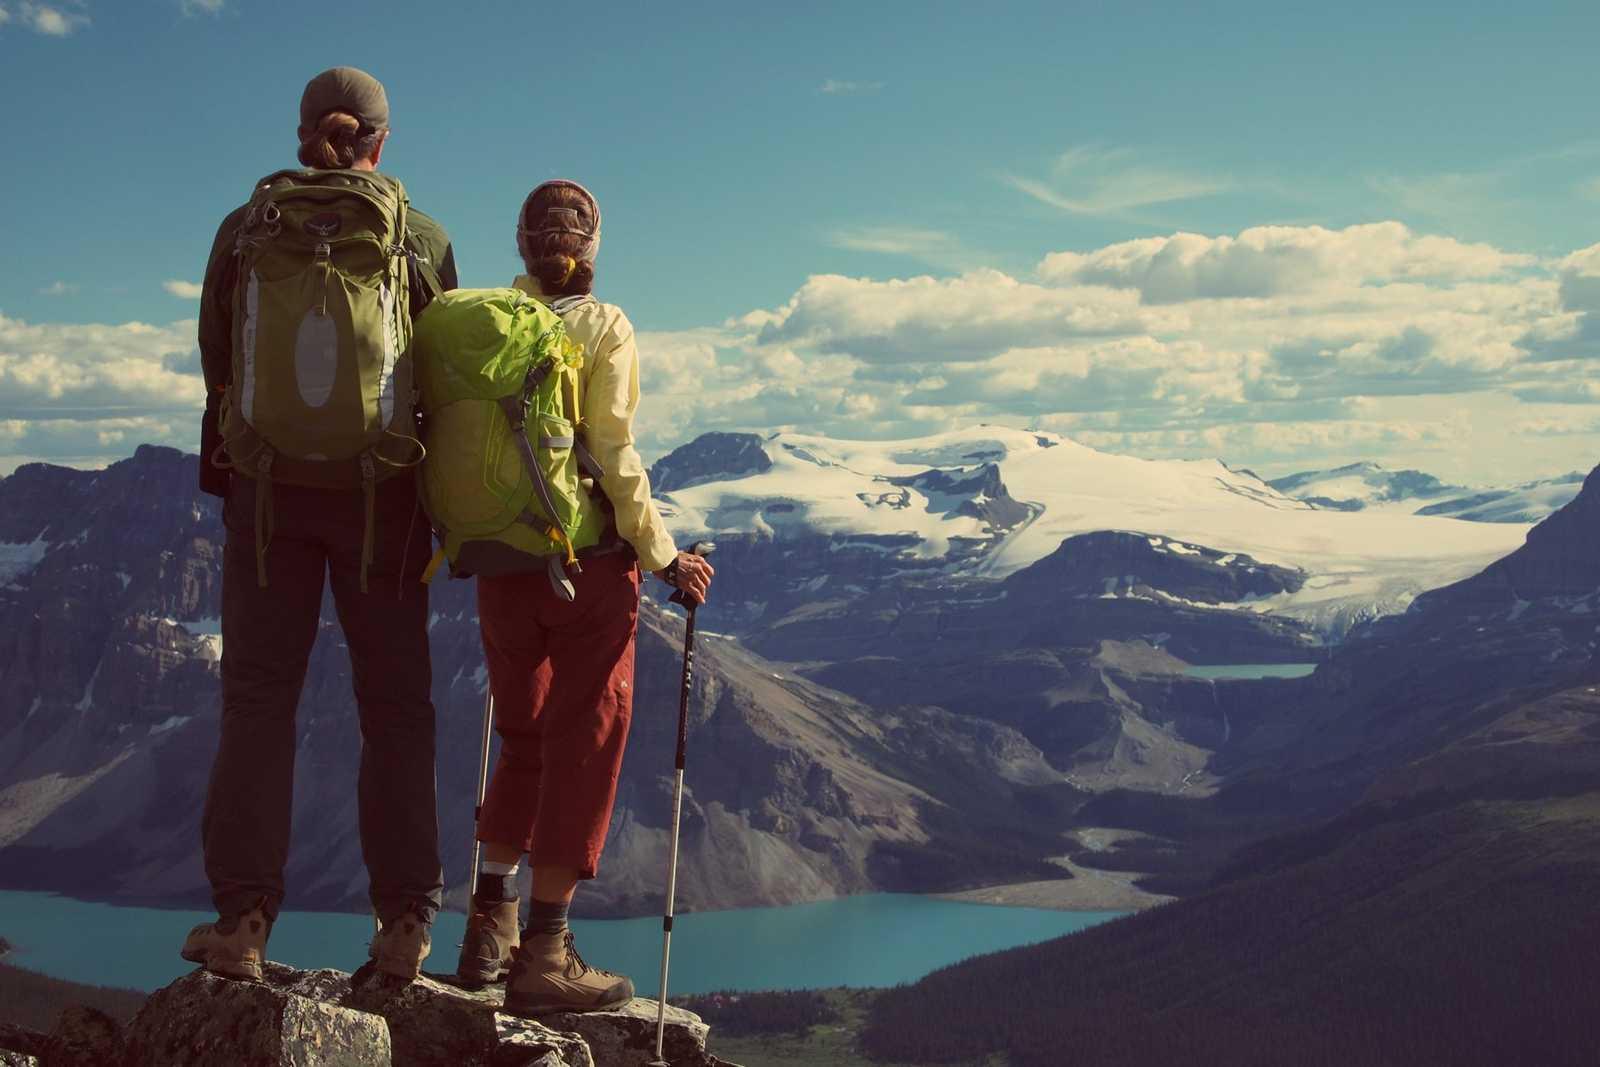 Hiking Trails in Banff - Banff National Park